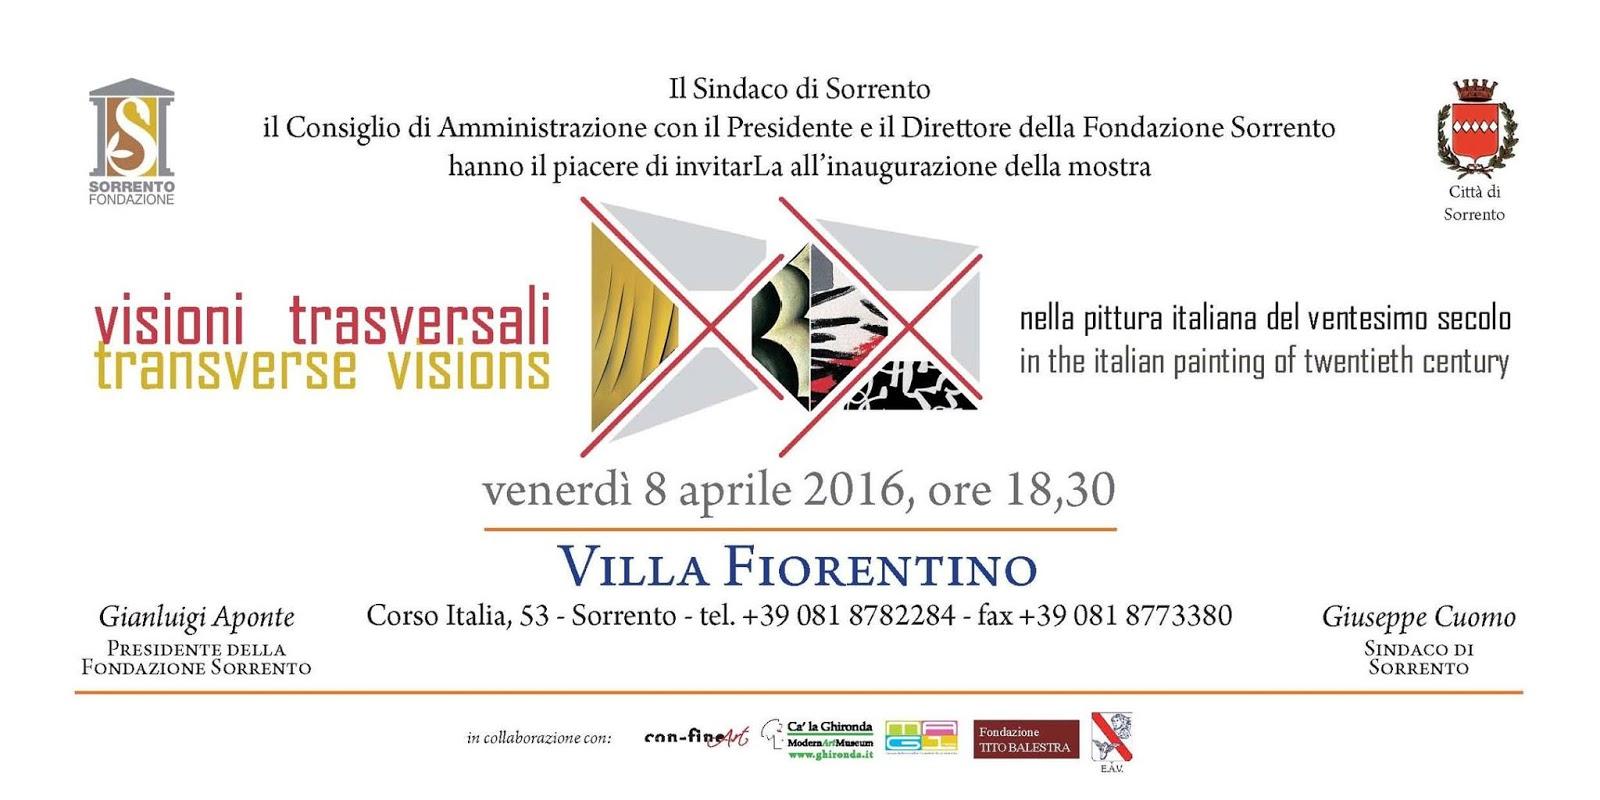 Visioni trasversali - Mostra d'arte a Sorrento 2016